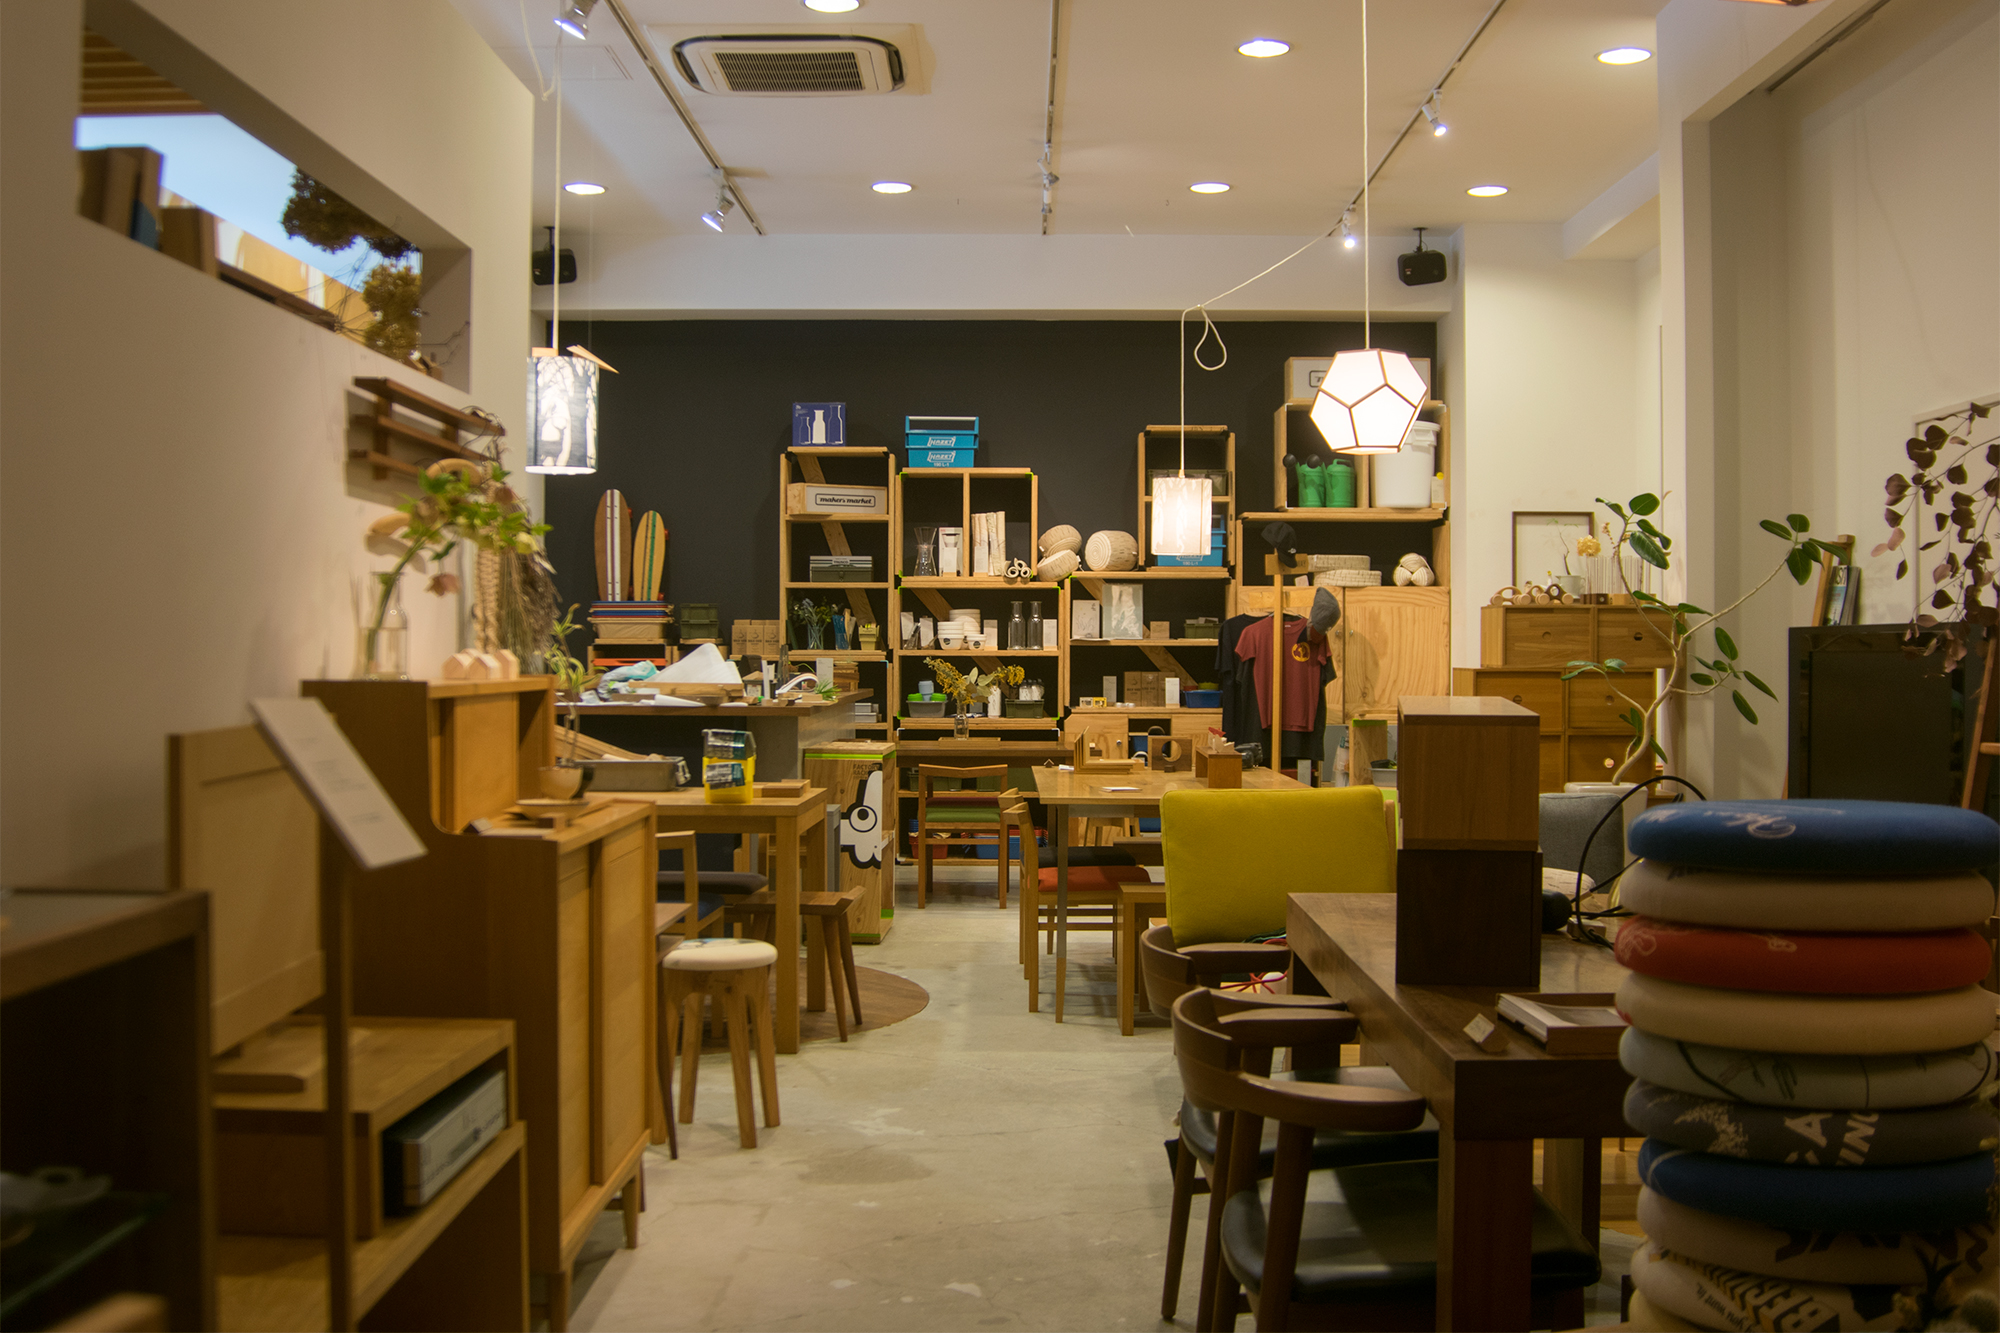 WOODWORK Welcom COFFEEのための改装工事中も店舗は通常通り営業します